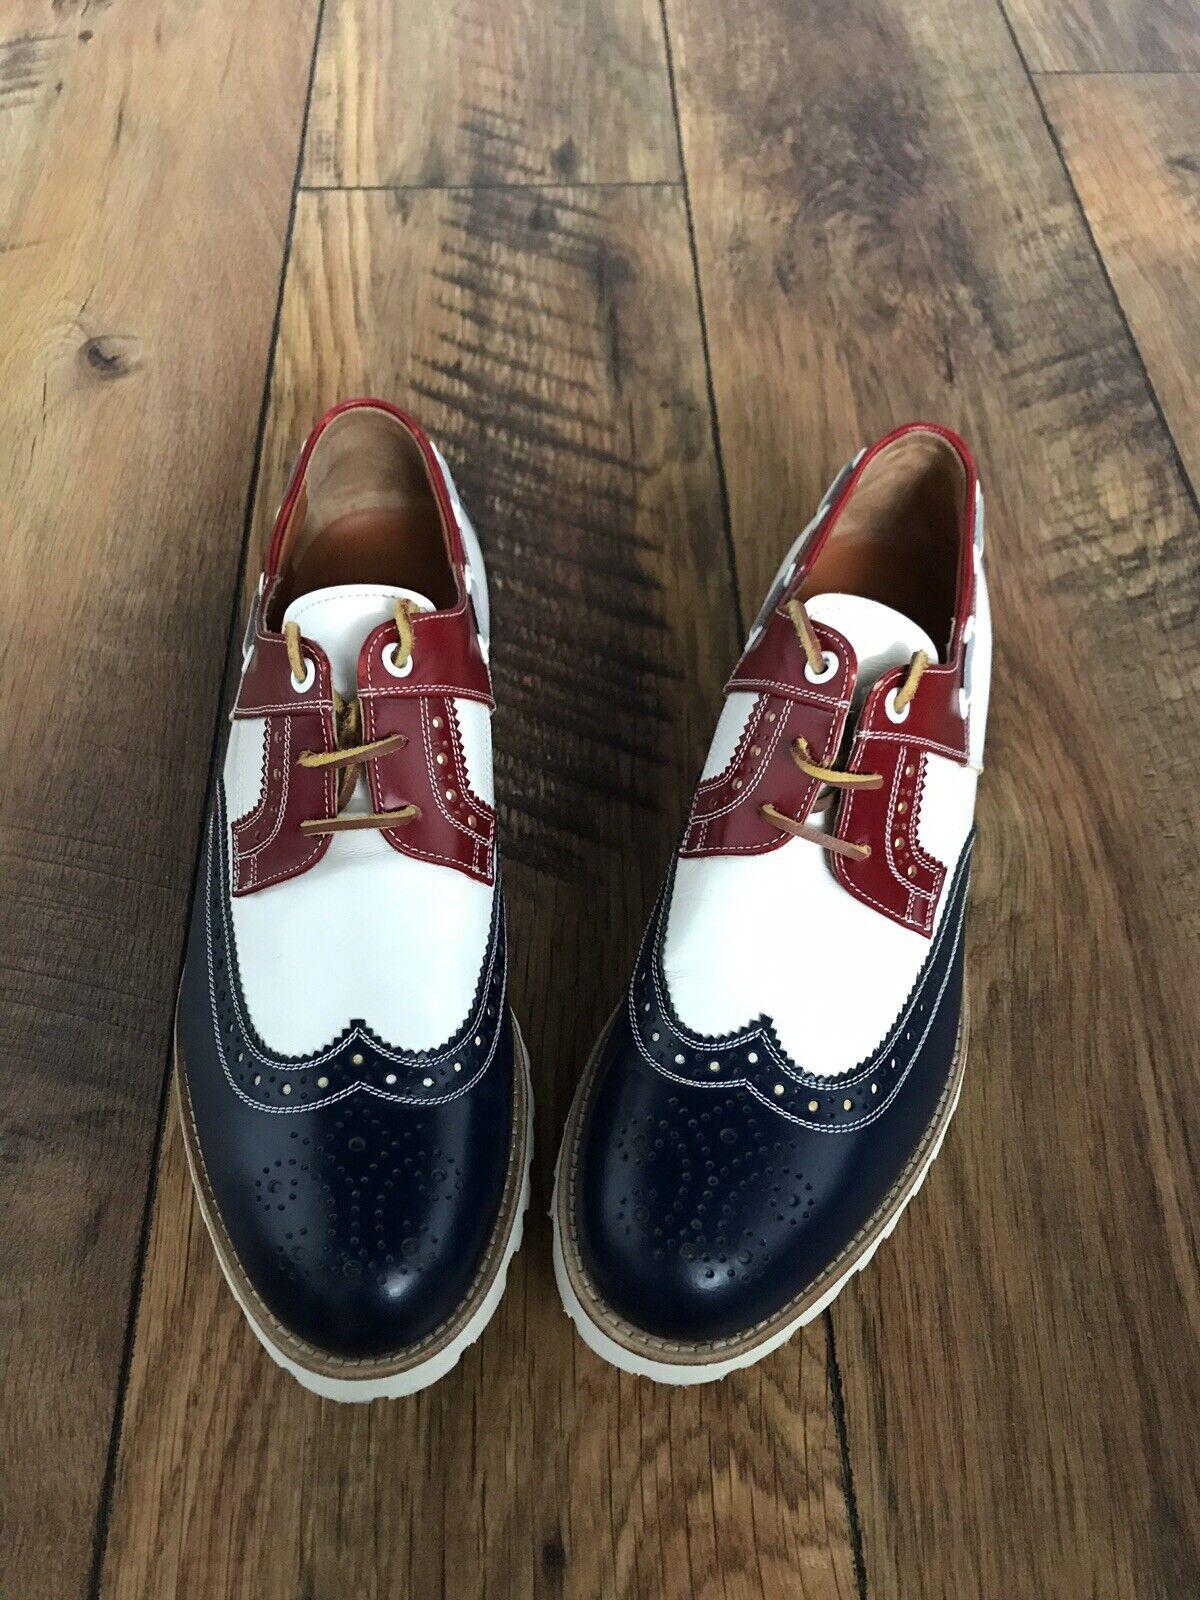 -50% sale Dsquarojo 2 Men's zapatos 100% auth.